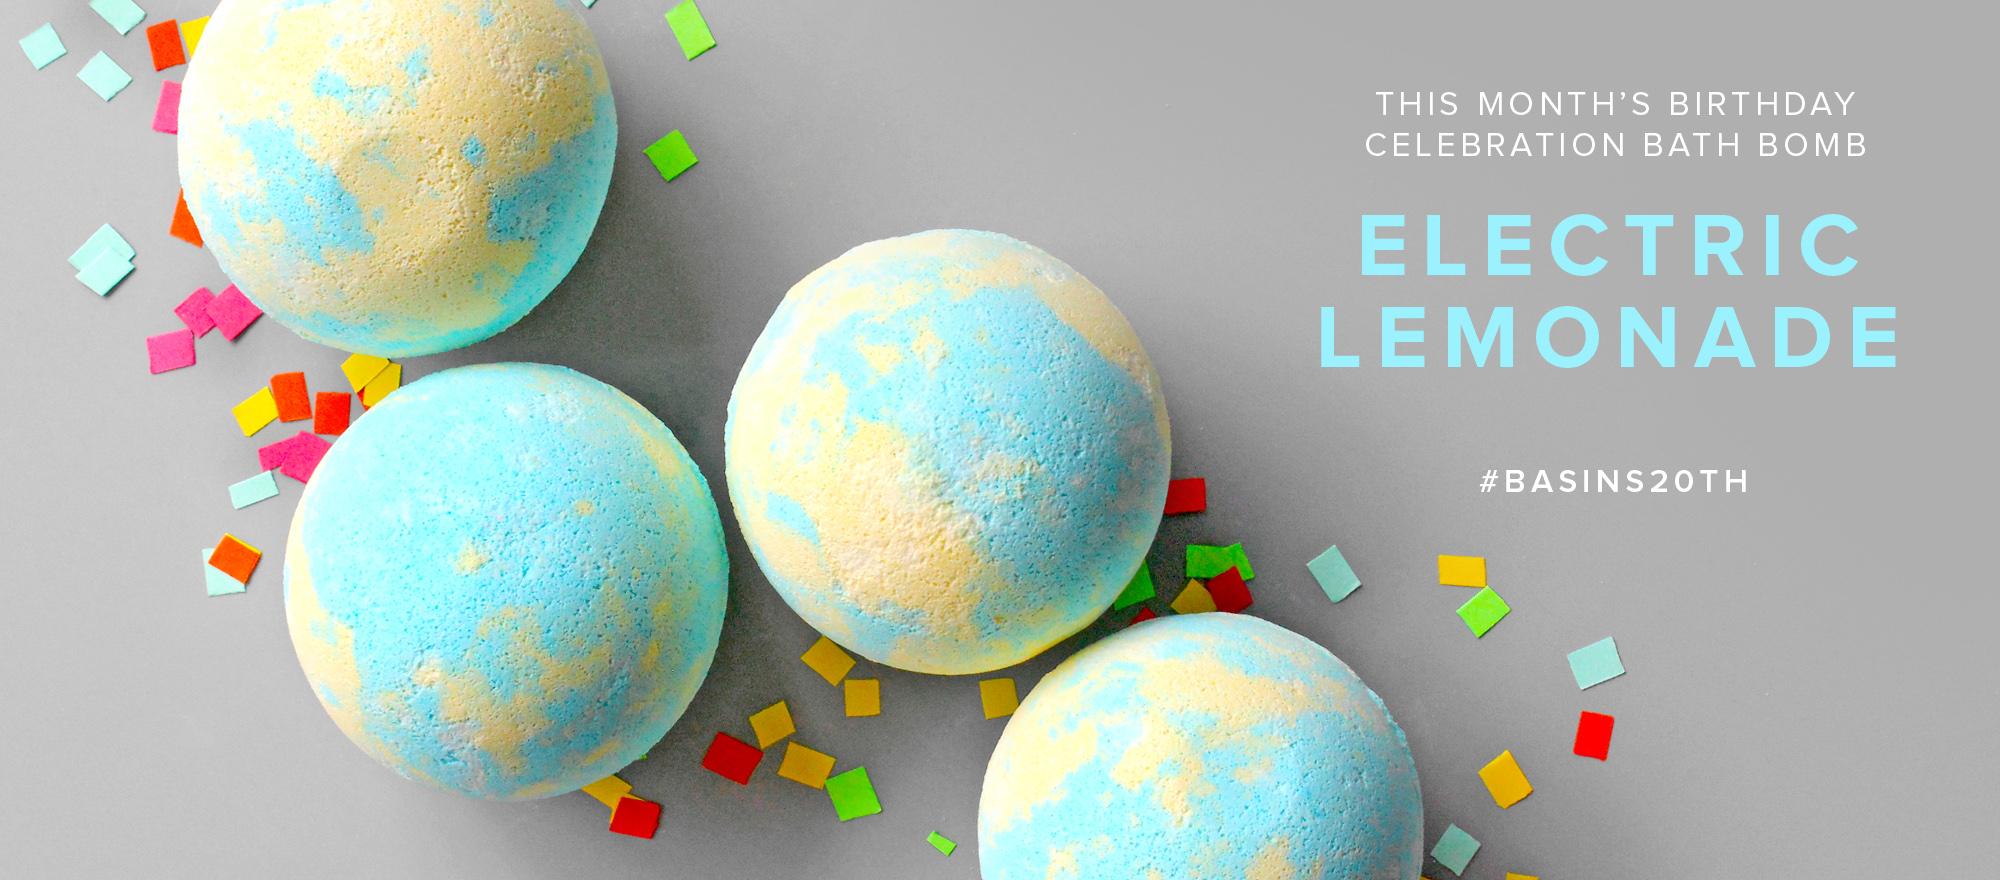 Electric Lemonade Bath Bomb